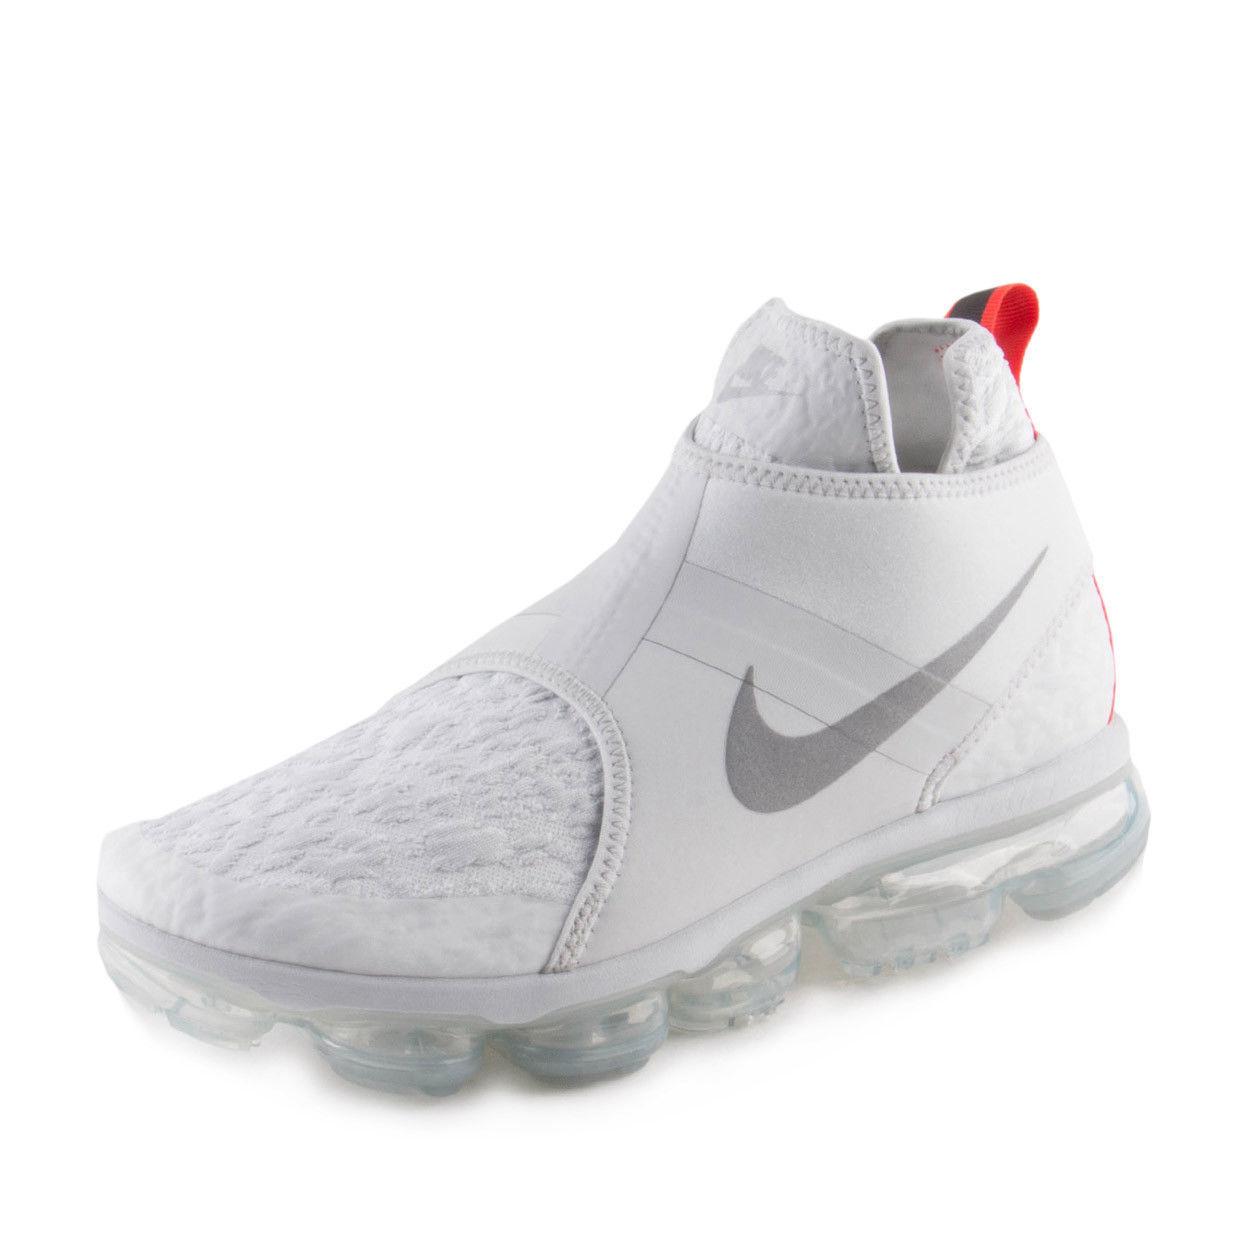 Nike air vapormax ohukka - dimensioni bianco puro platino / ao9326 -